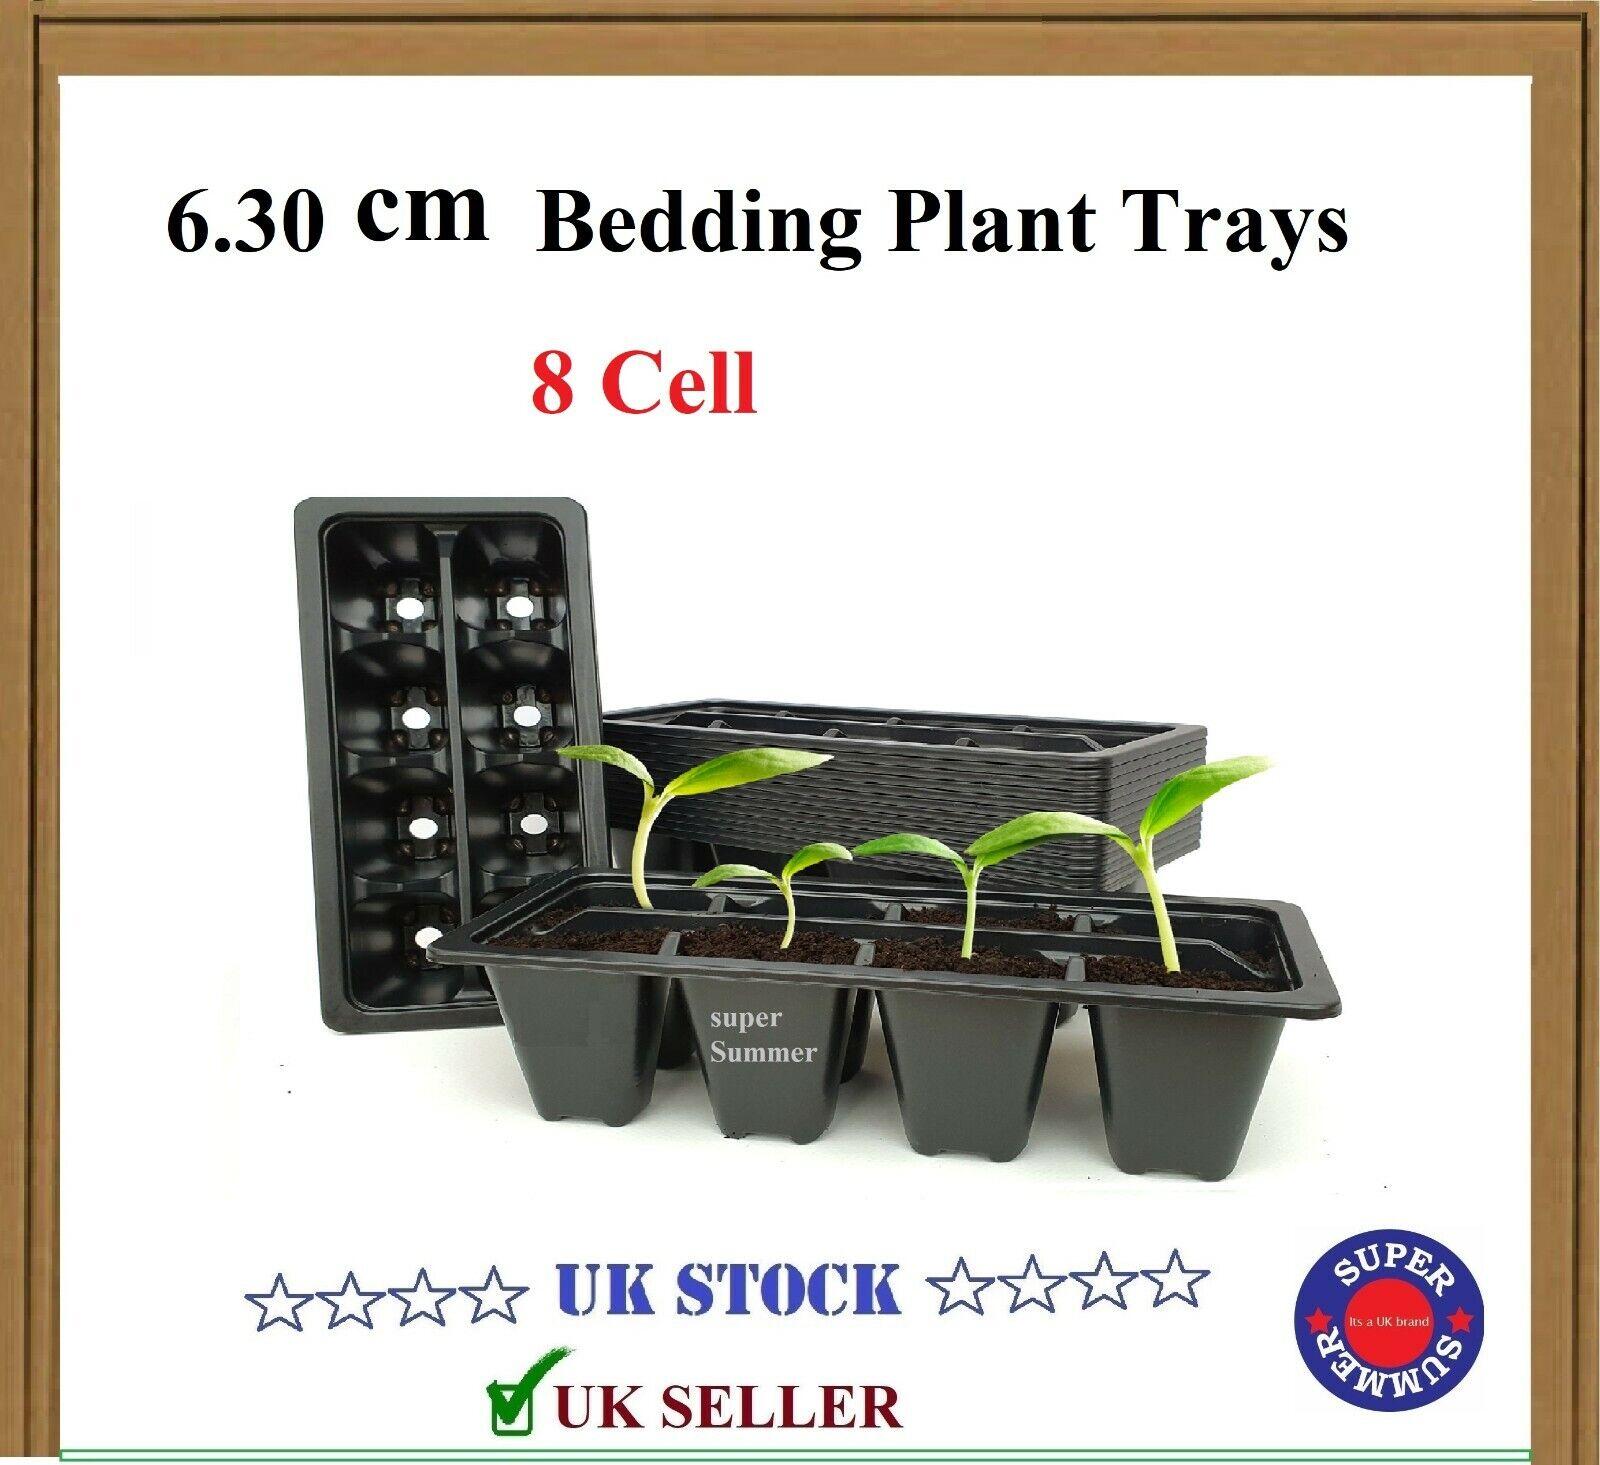 Bedding Plant Trays I Trolley Packs I 8 Cell I (Black) I Reusable